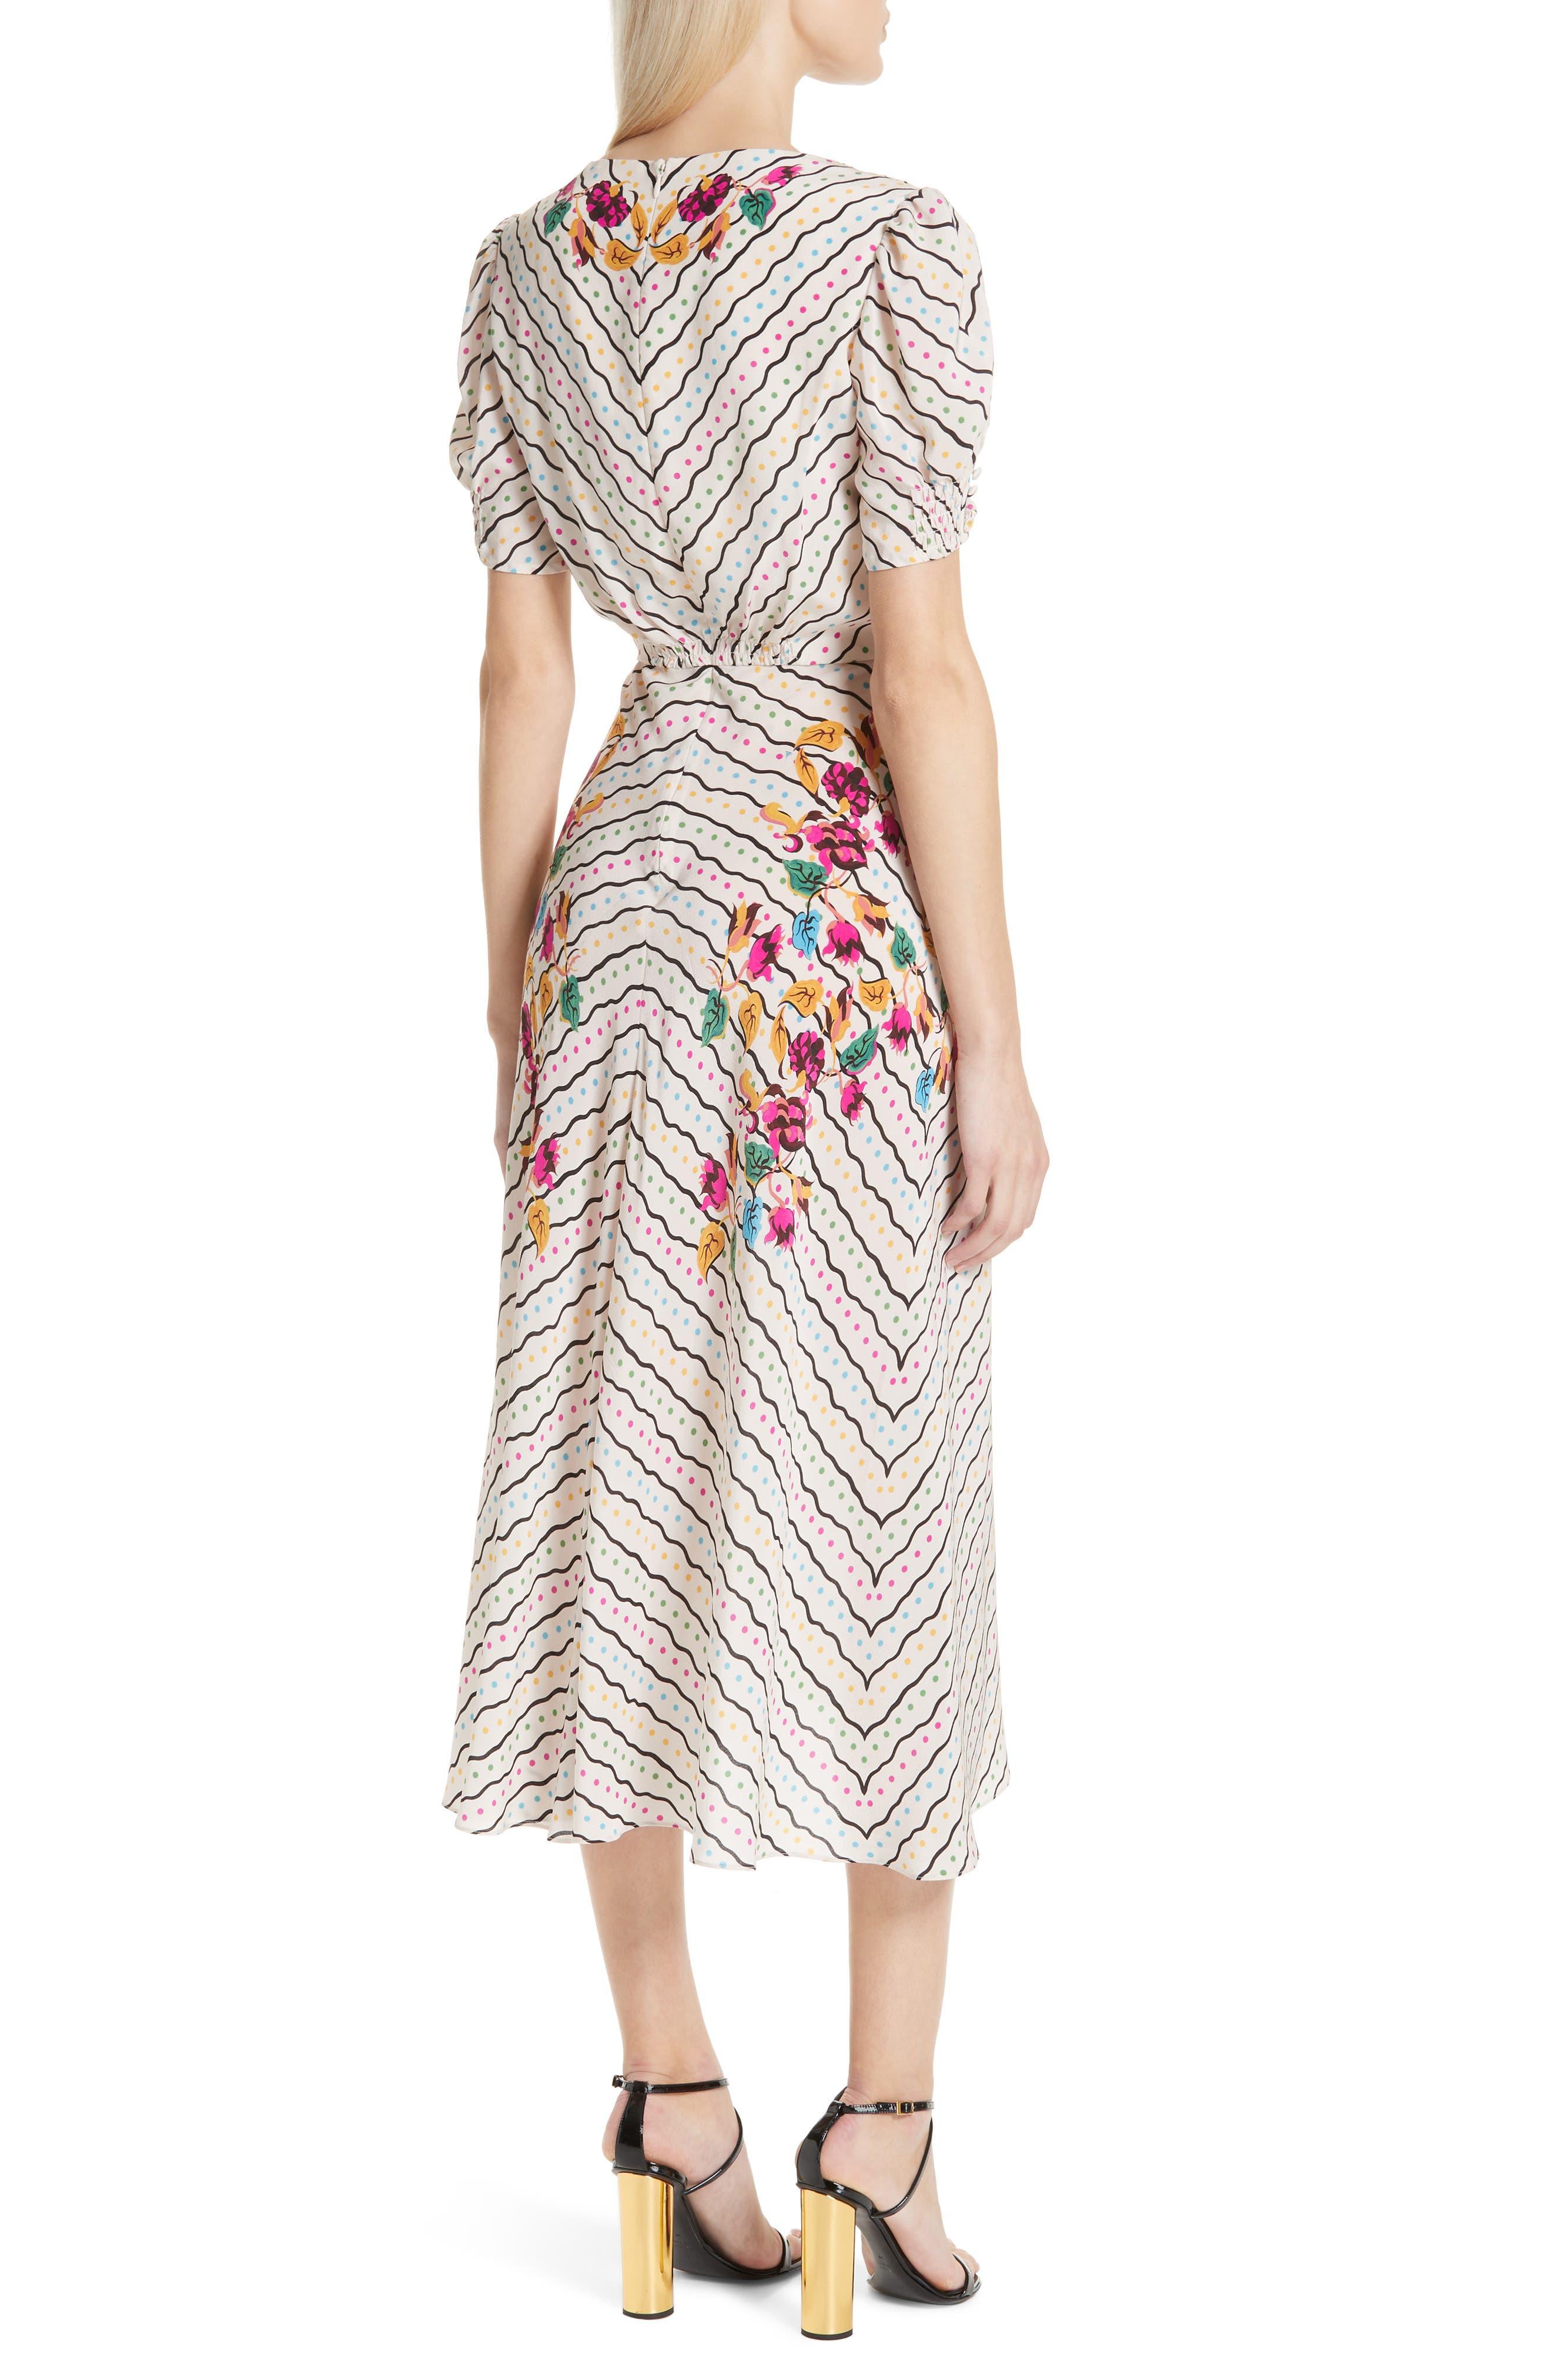 SALONI, Lea Silk Midi Dress, Alternate thumbnail 2, color, JAPONICA WIGGLE PLACEMENT